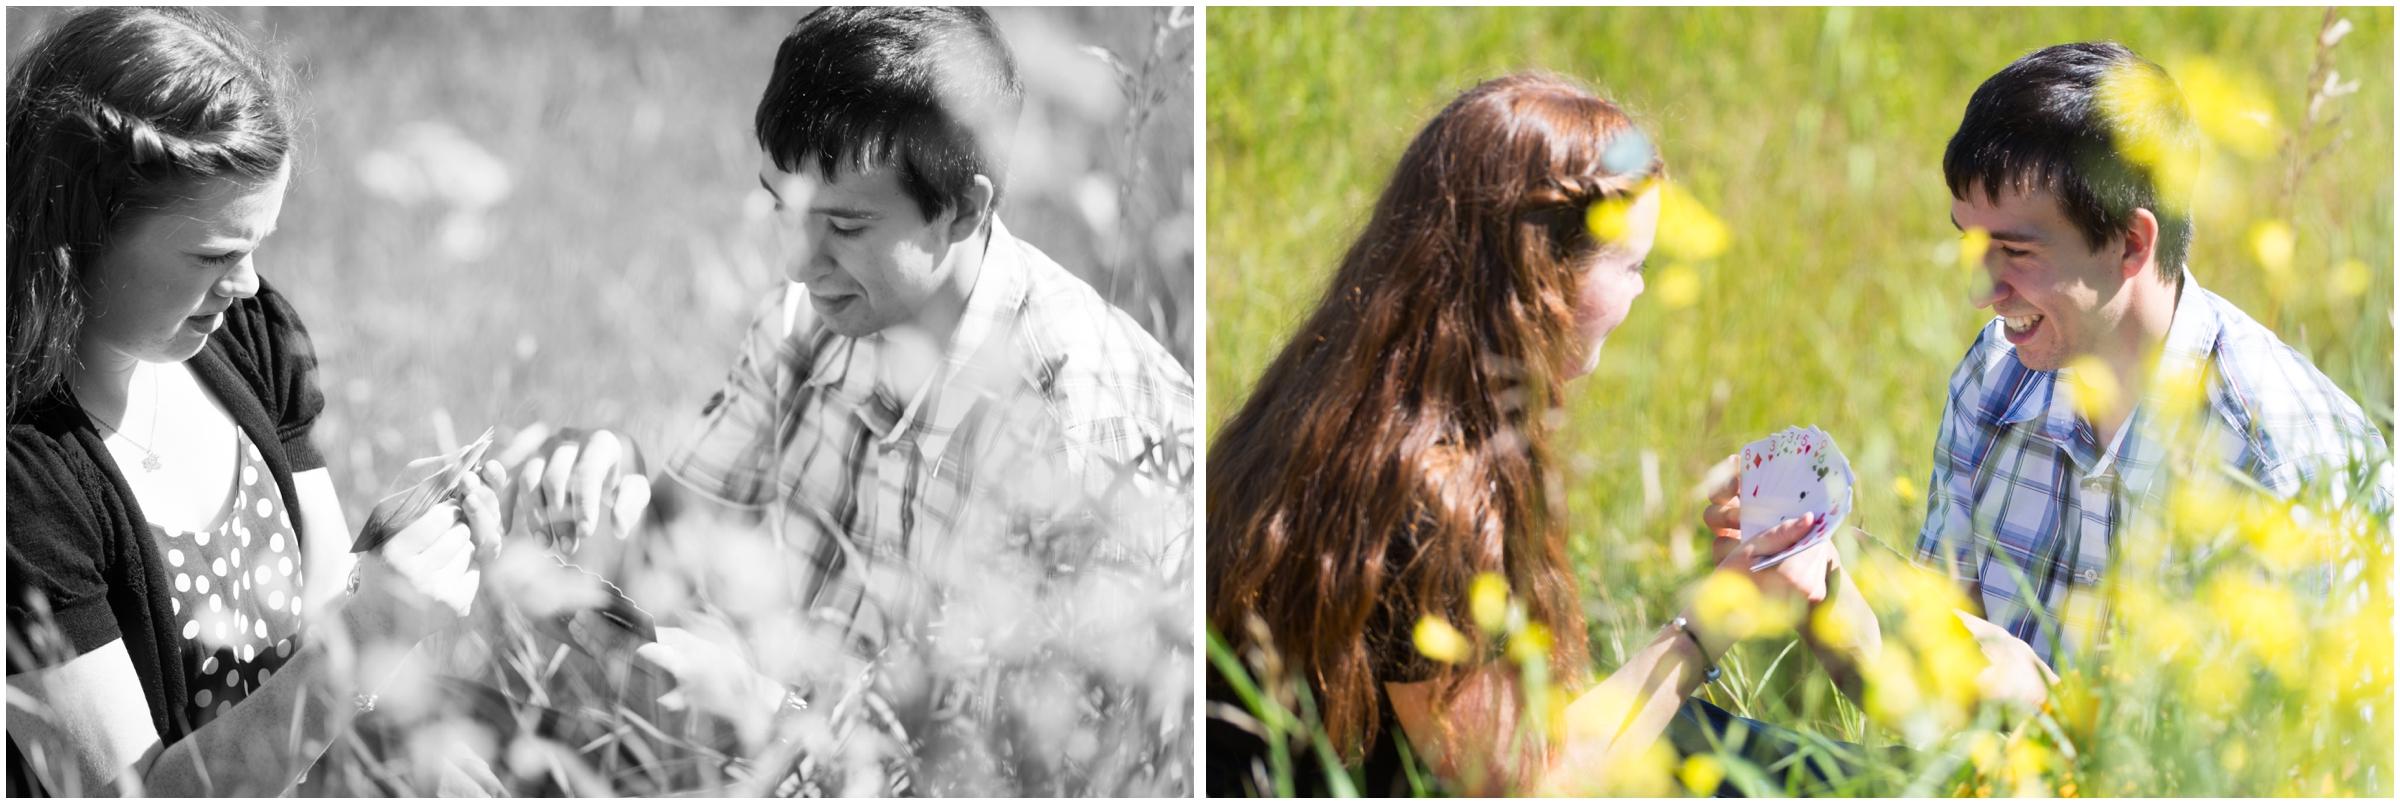 Hannah and Jarrett Selena Phillips-Boyle_0011.jpg